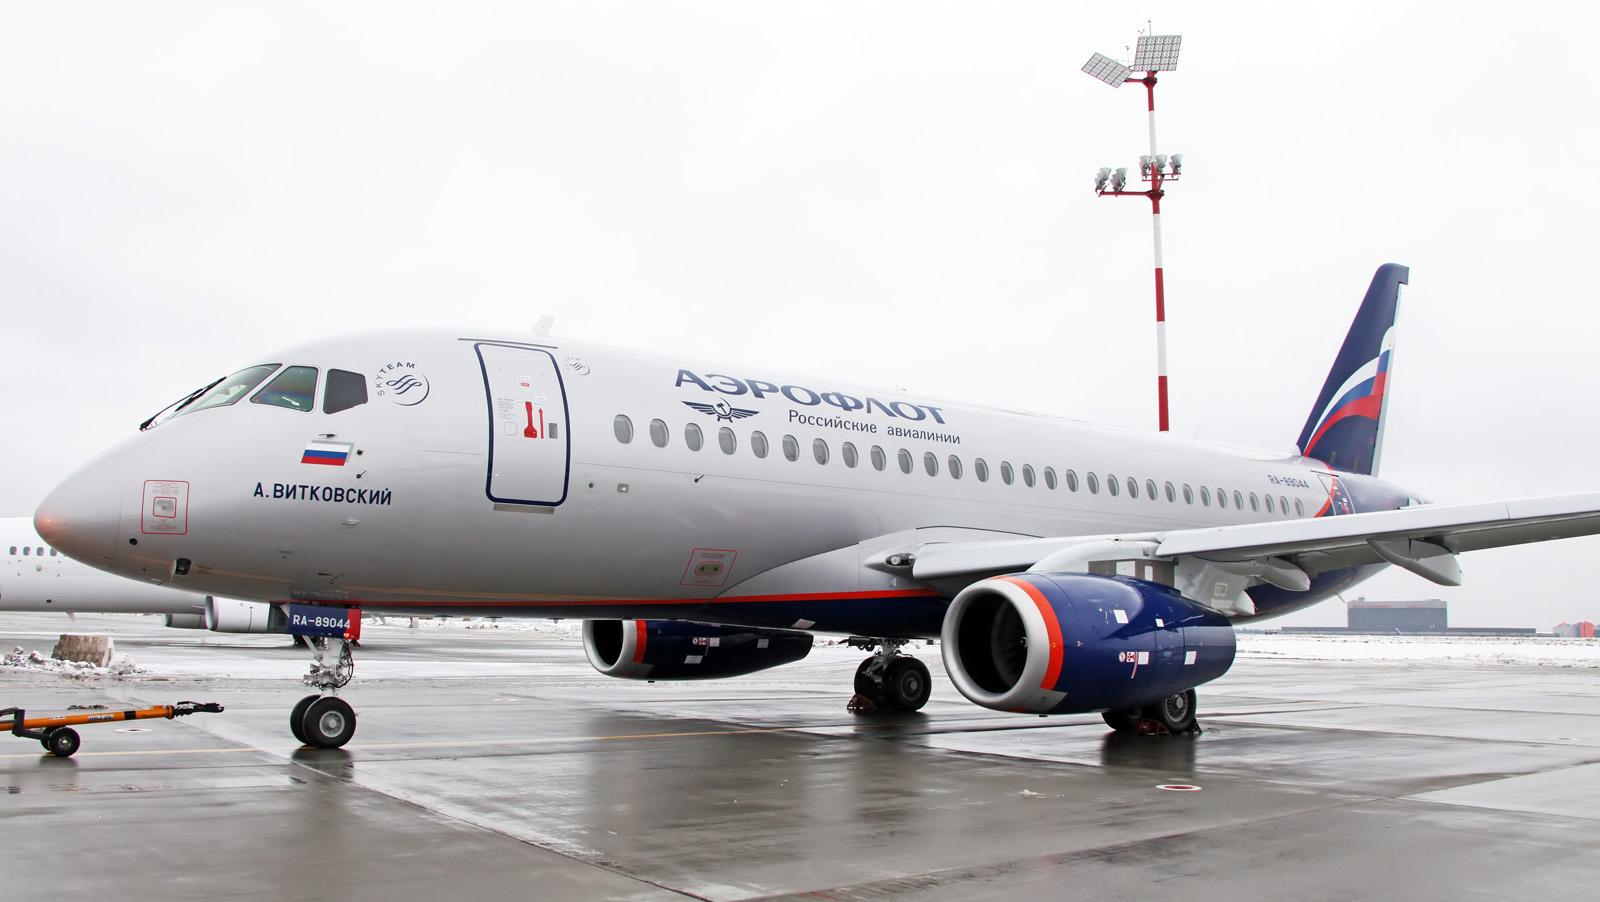 Sukhoi Superjet-100 RA-89044 (95076)